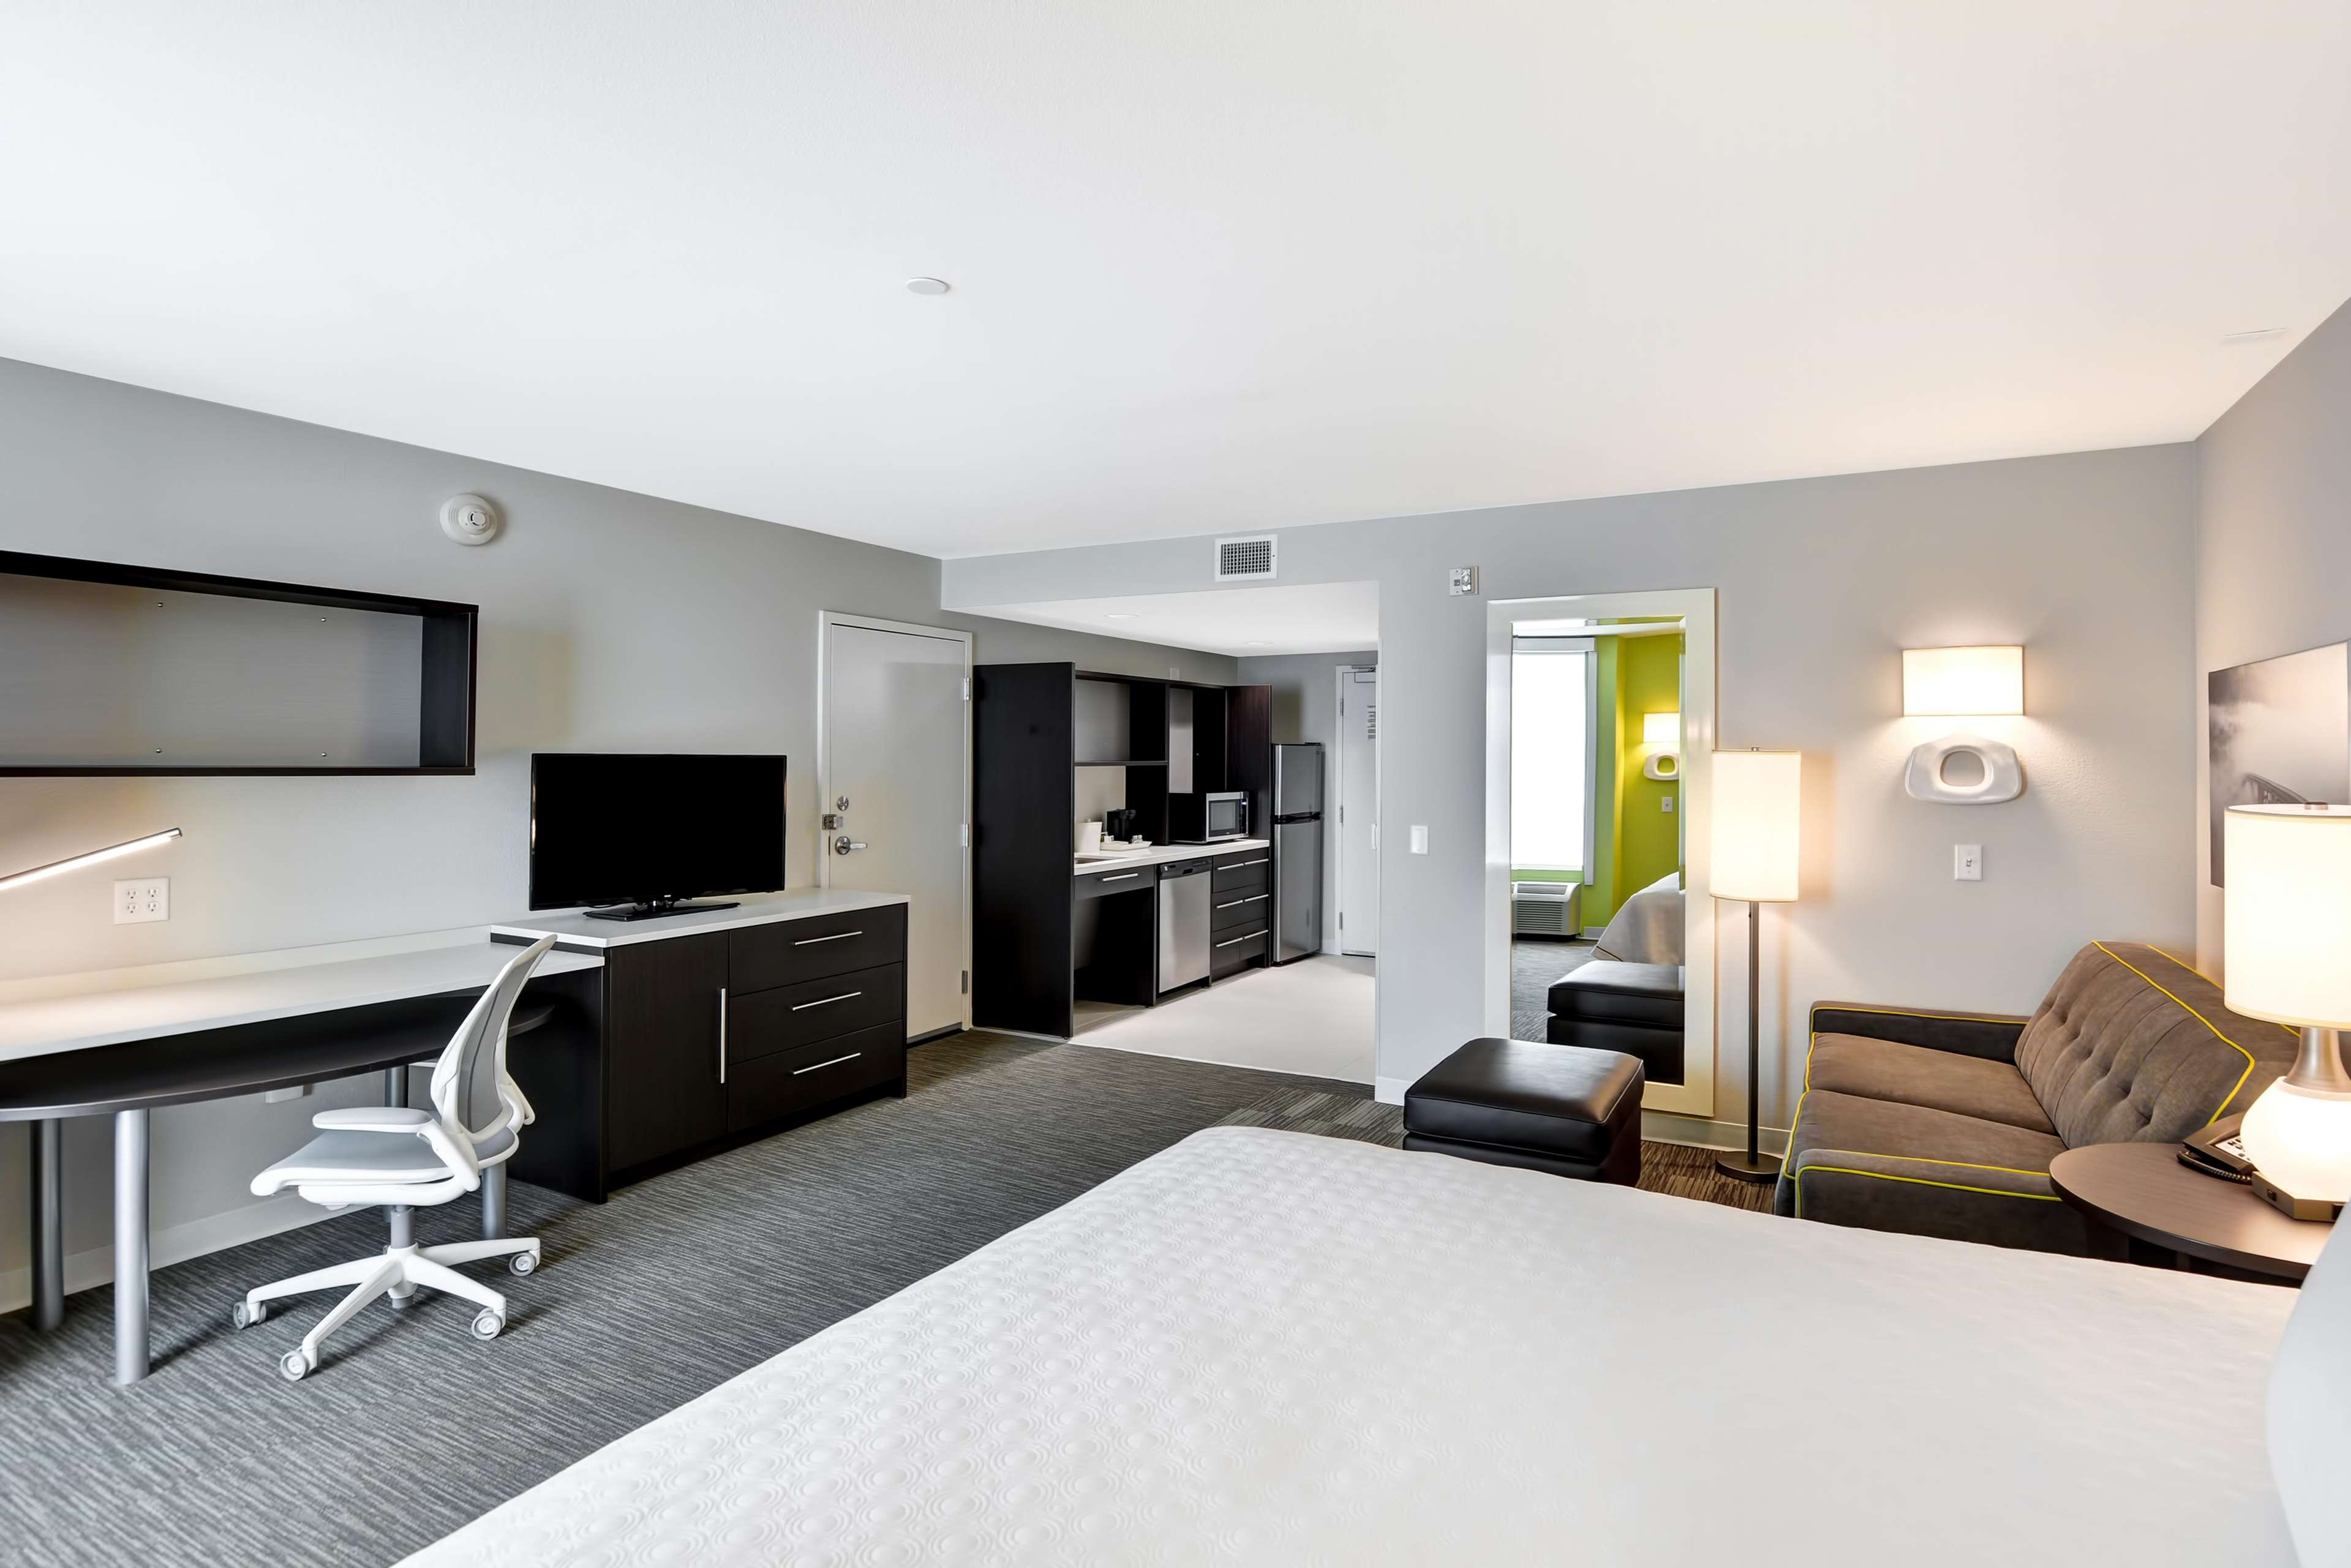 Home2 Suites by Hilton Azusa image 21